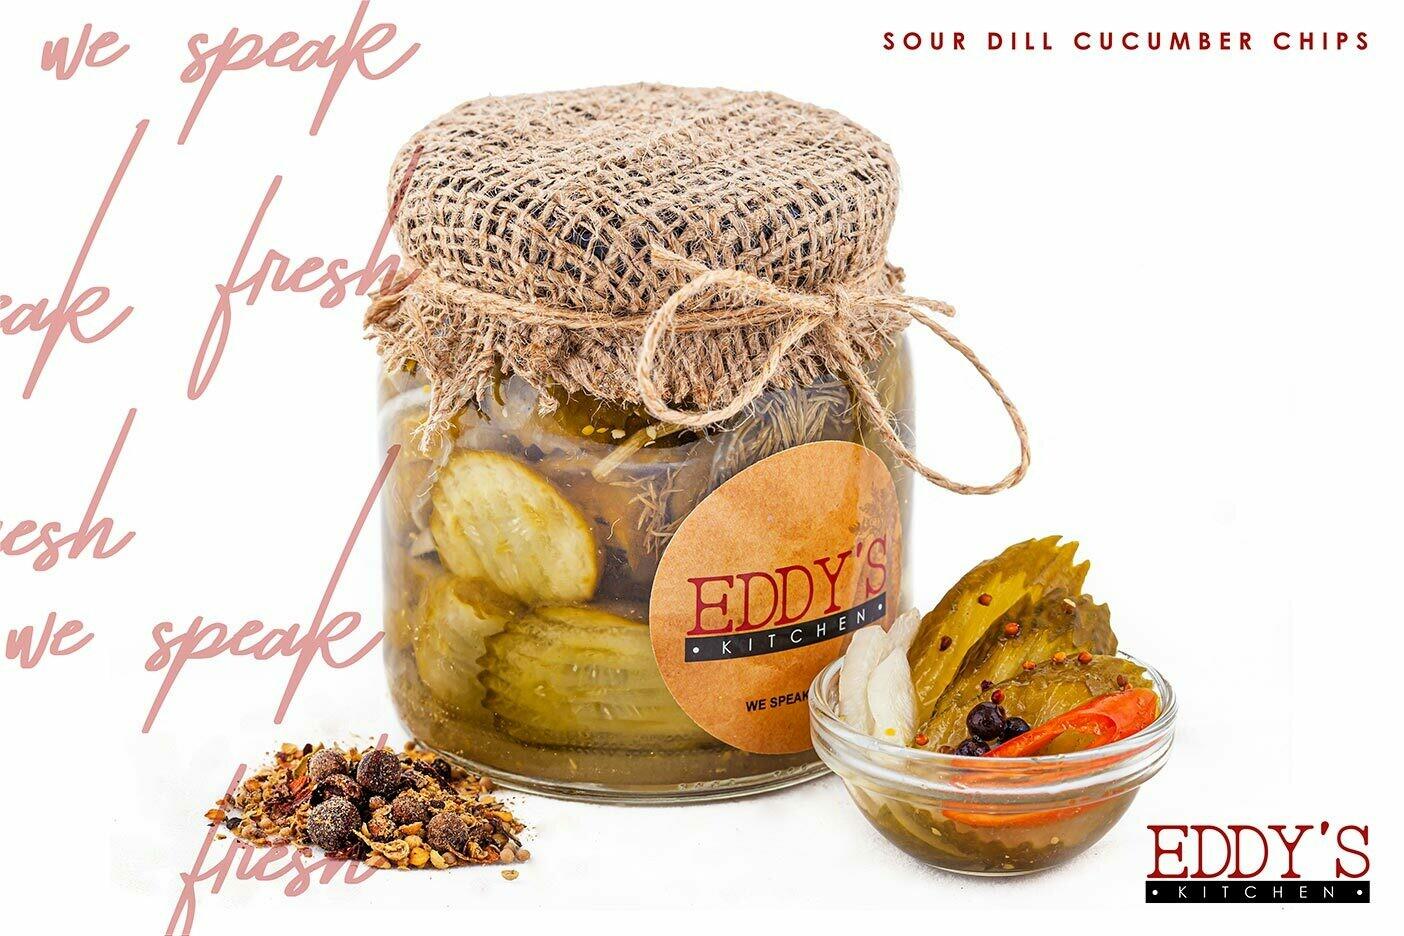 Sour Dill Pickle Slices (530g) شرائح الخيار المخلل